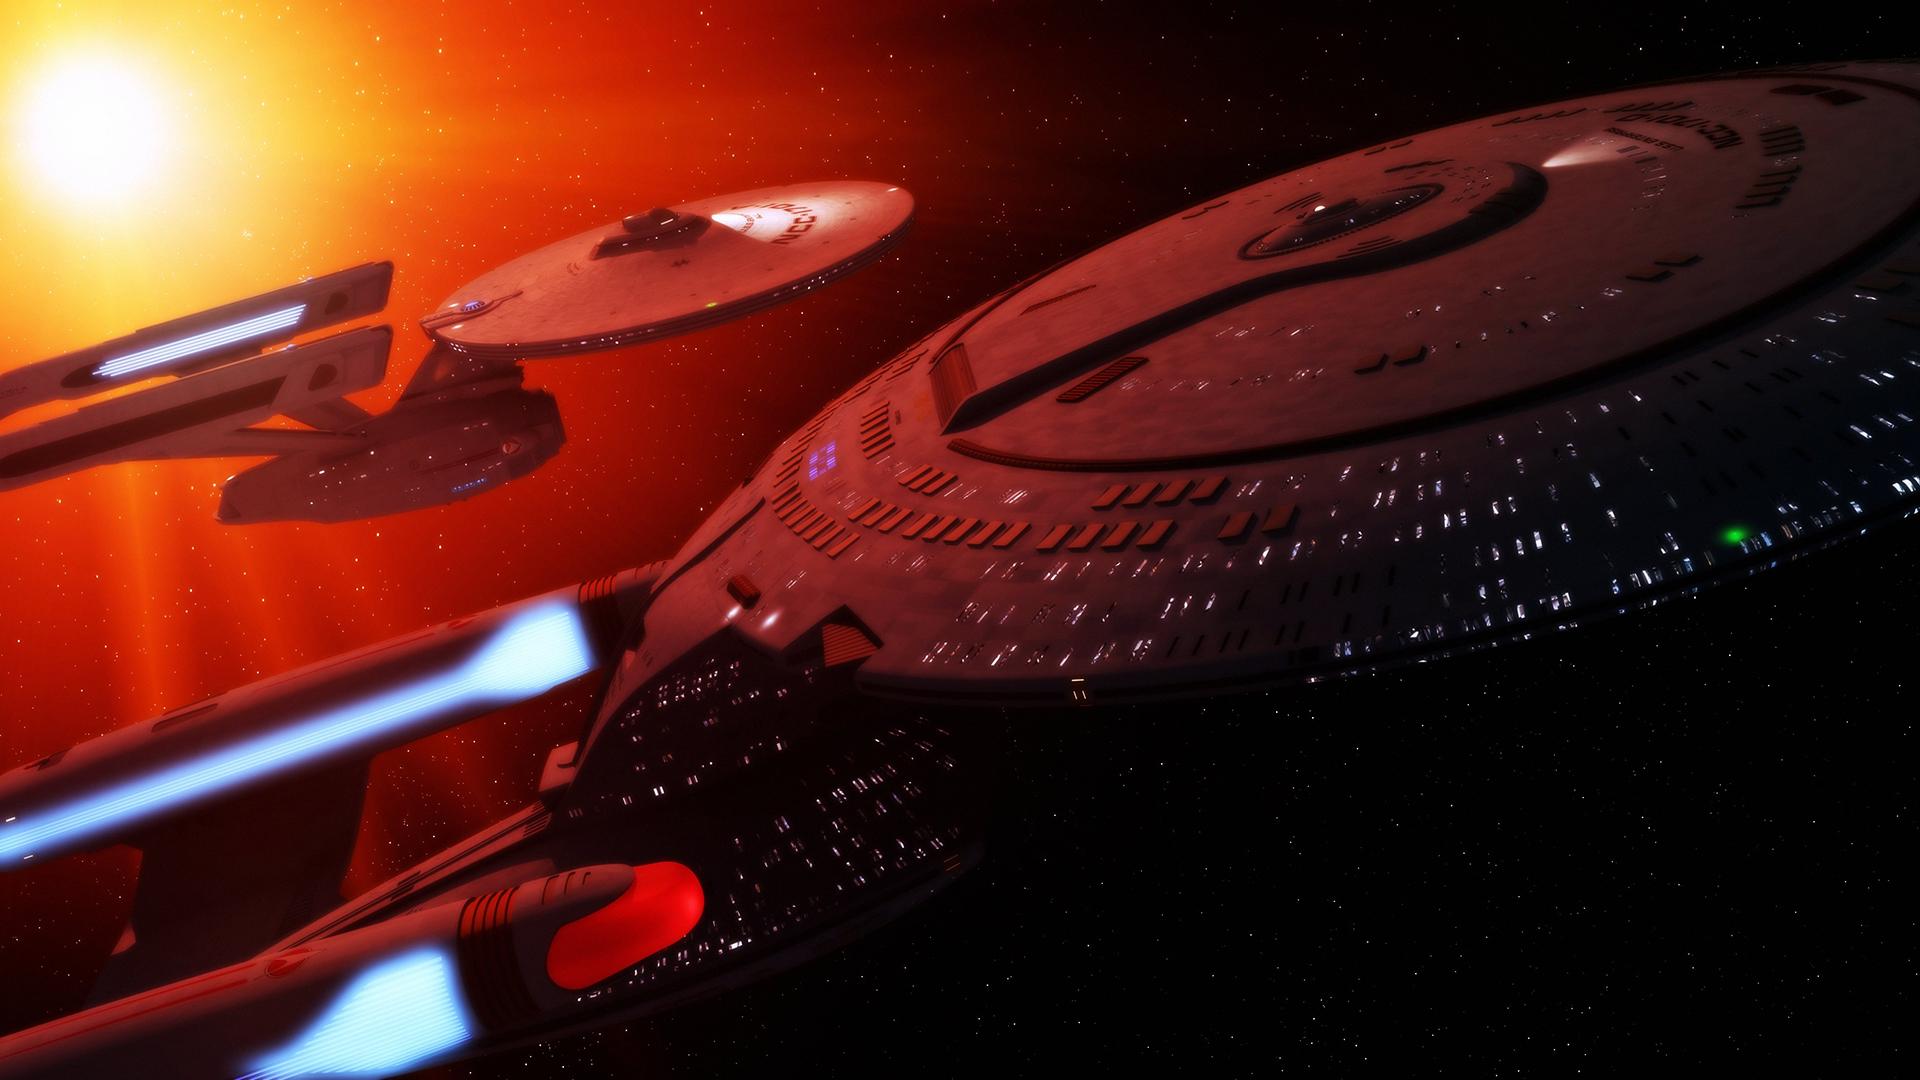 Starship Enterprise Spaceship Starlight space movies sci fi wallpaper 1920x1080